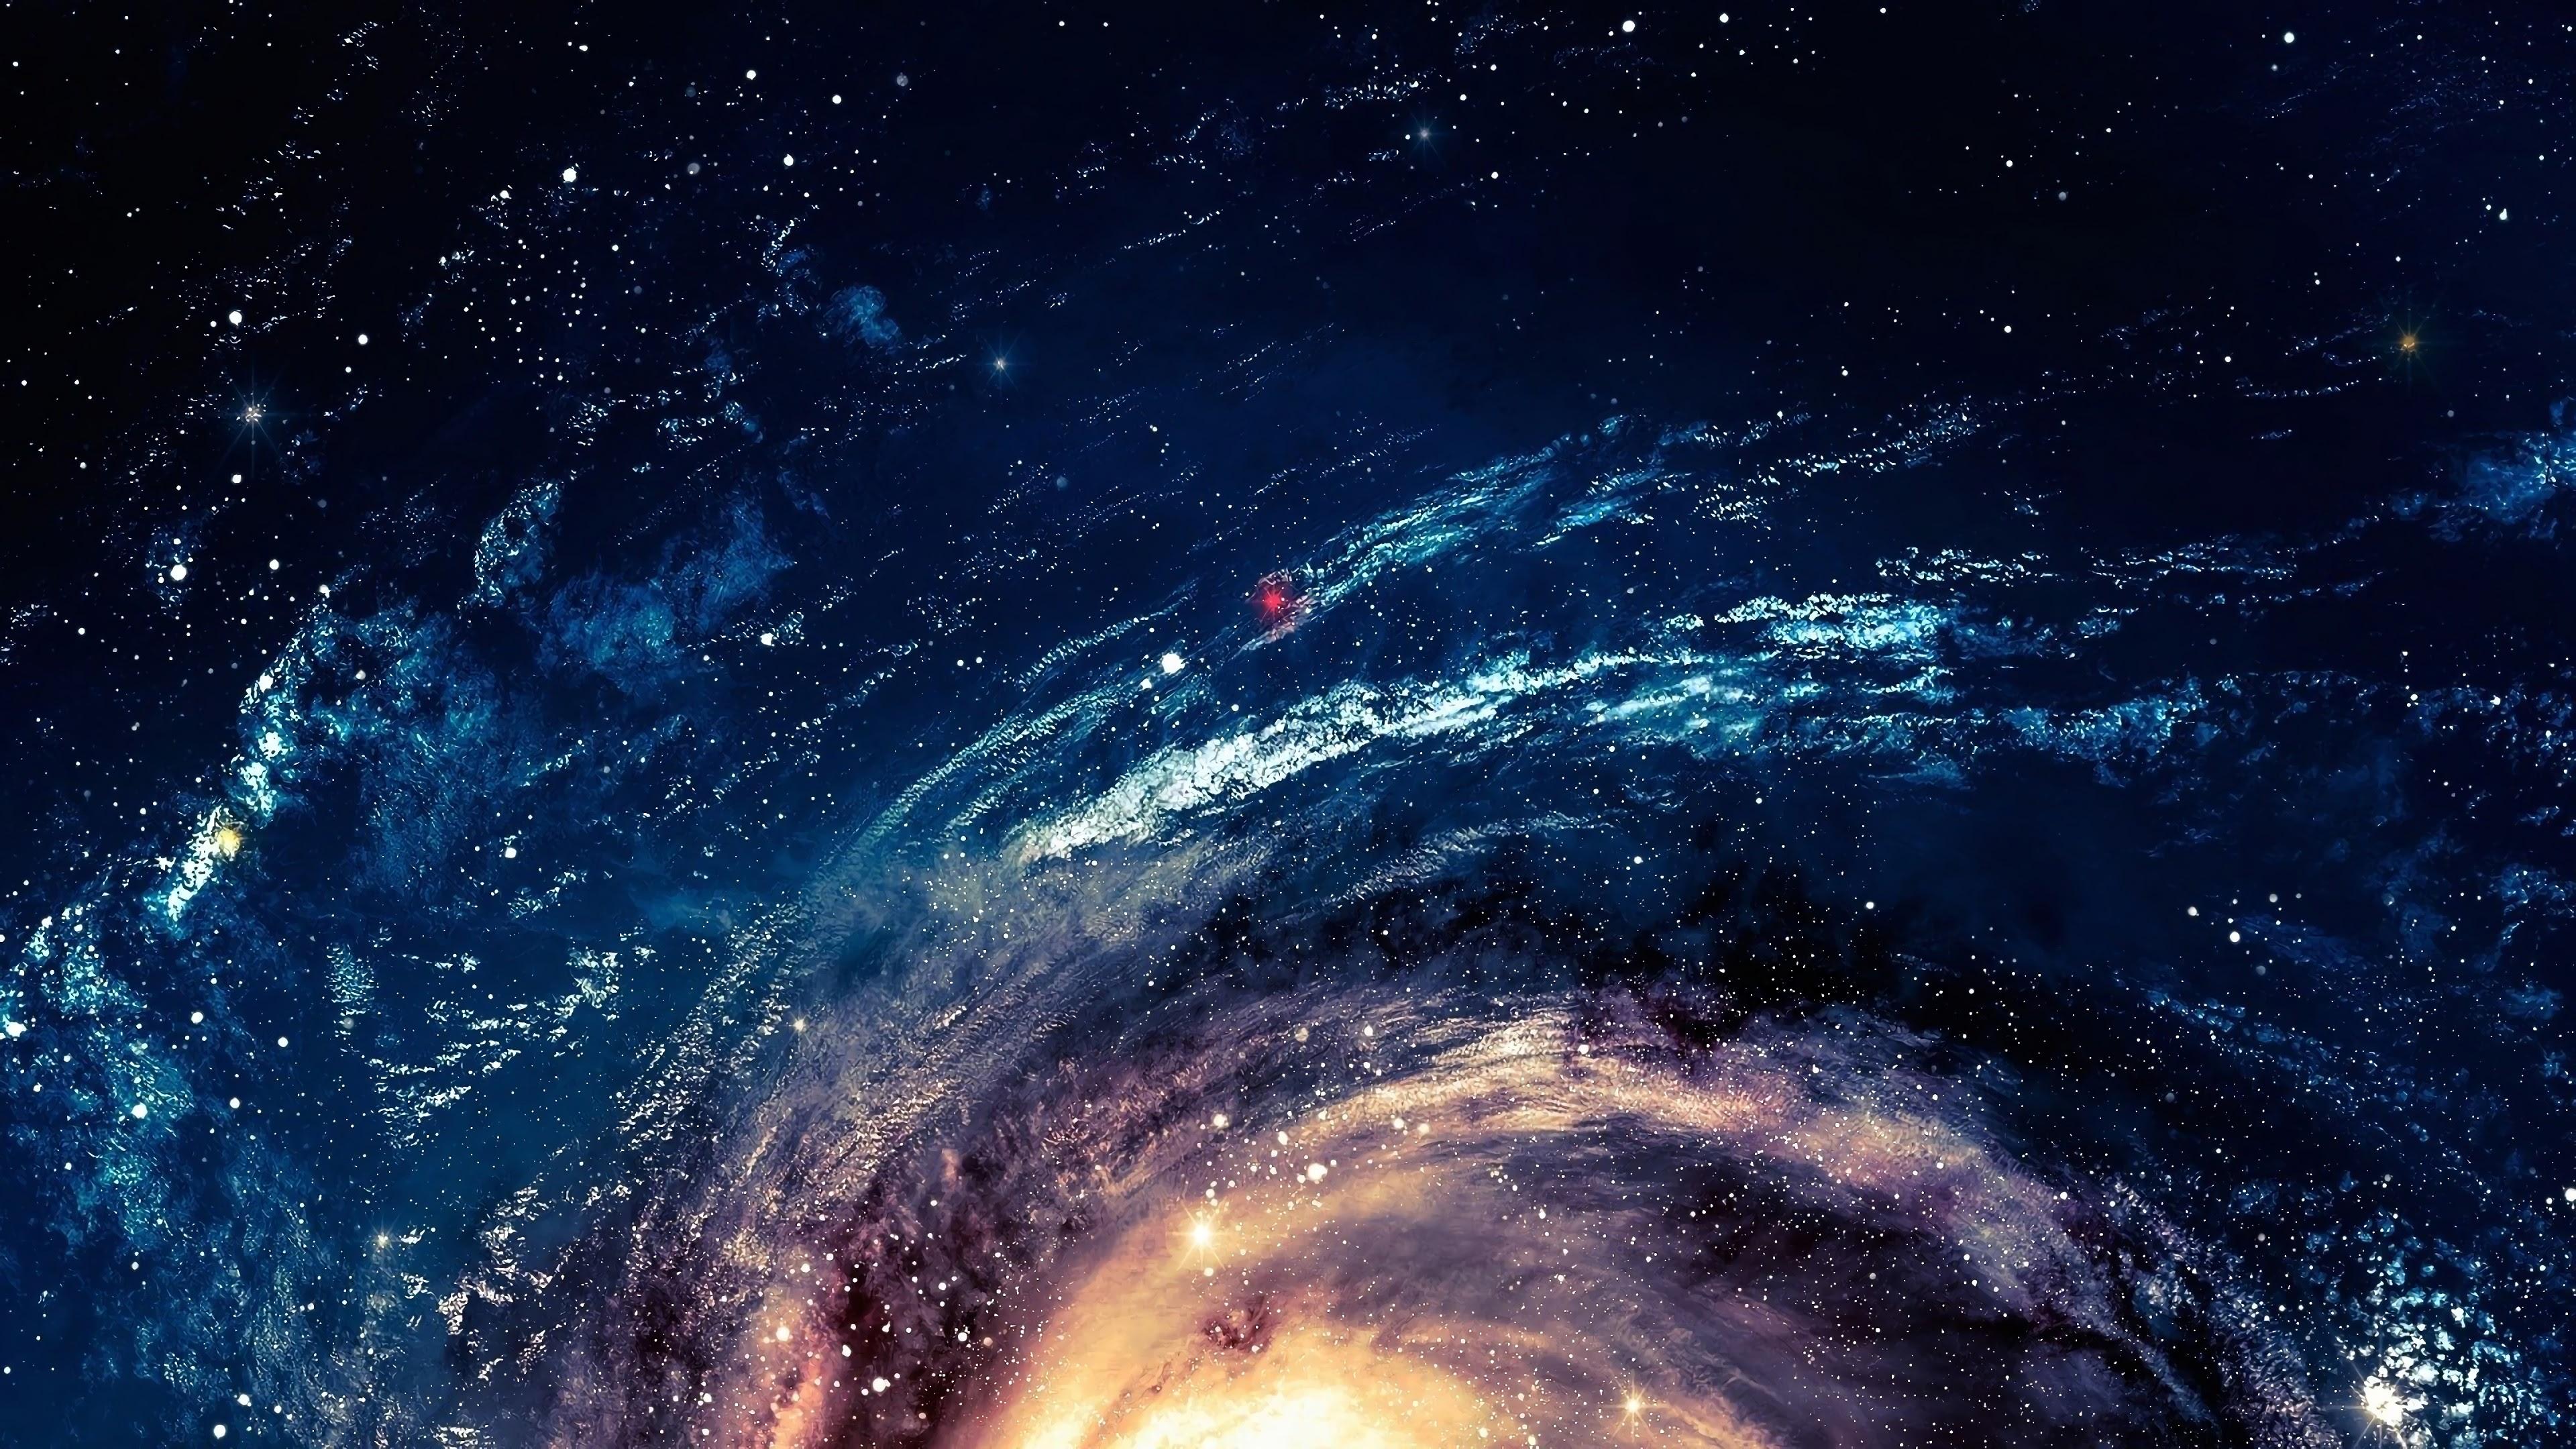 Galaxy, Space, Stars, Background, 4K, 3840x2160, #29 Wallpaper